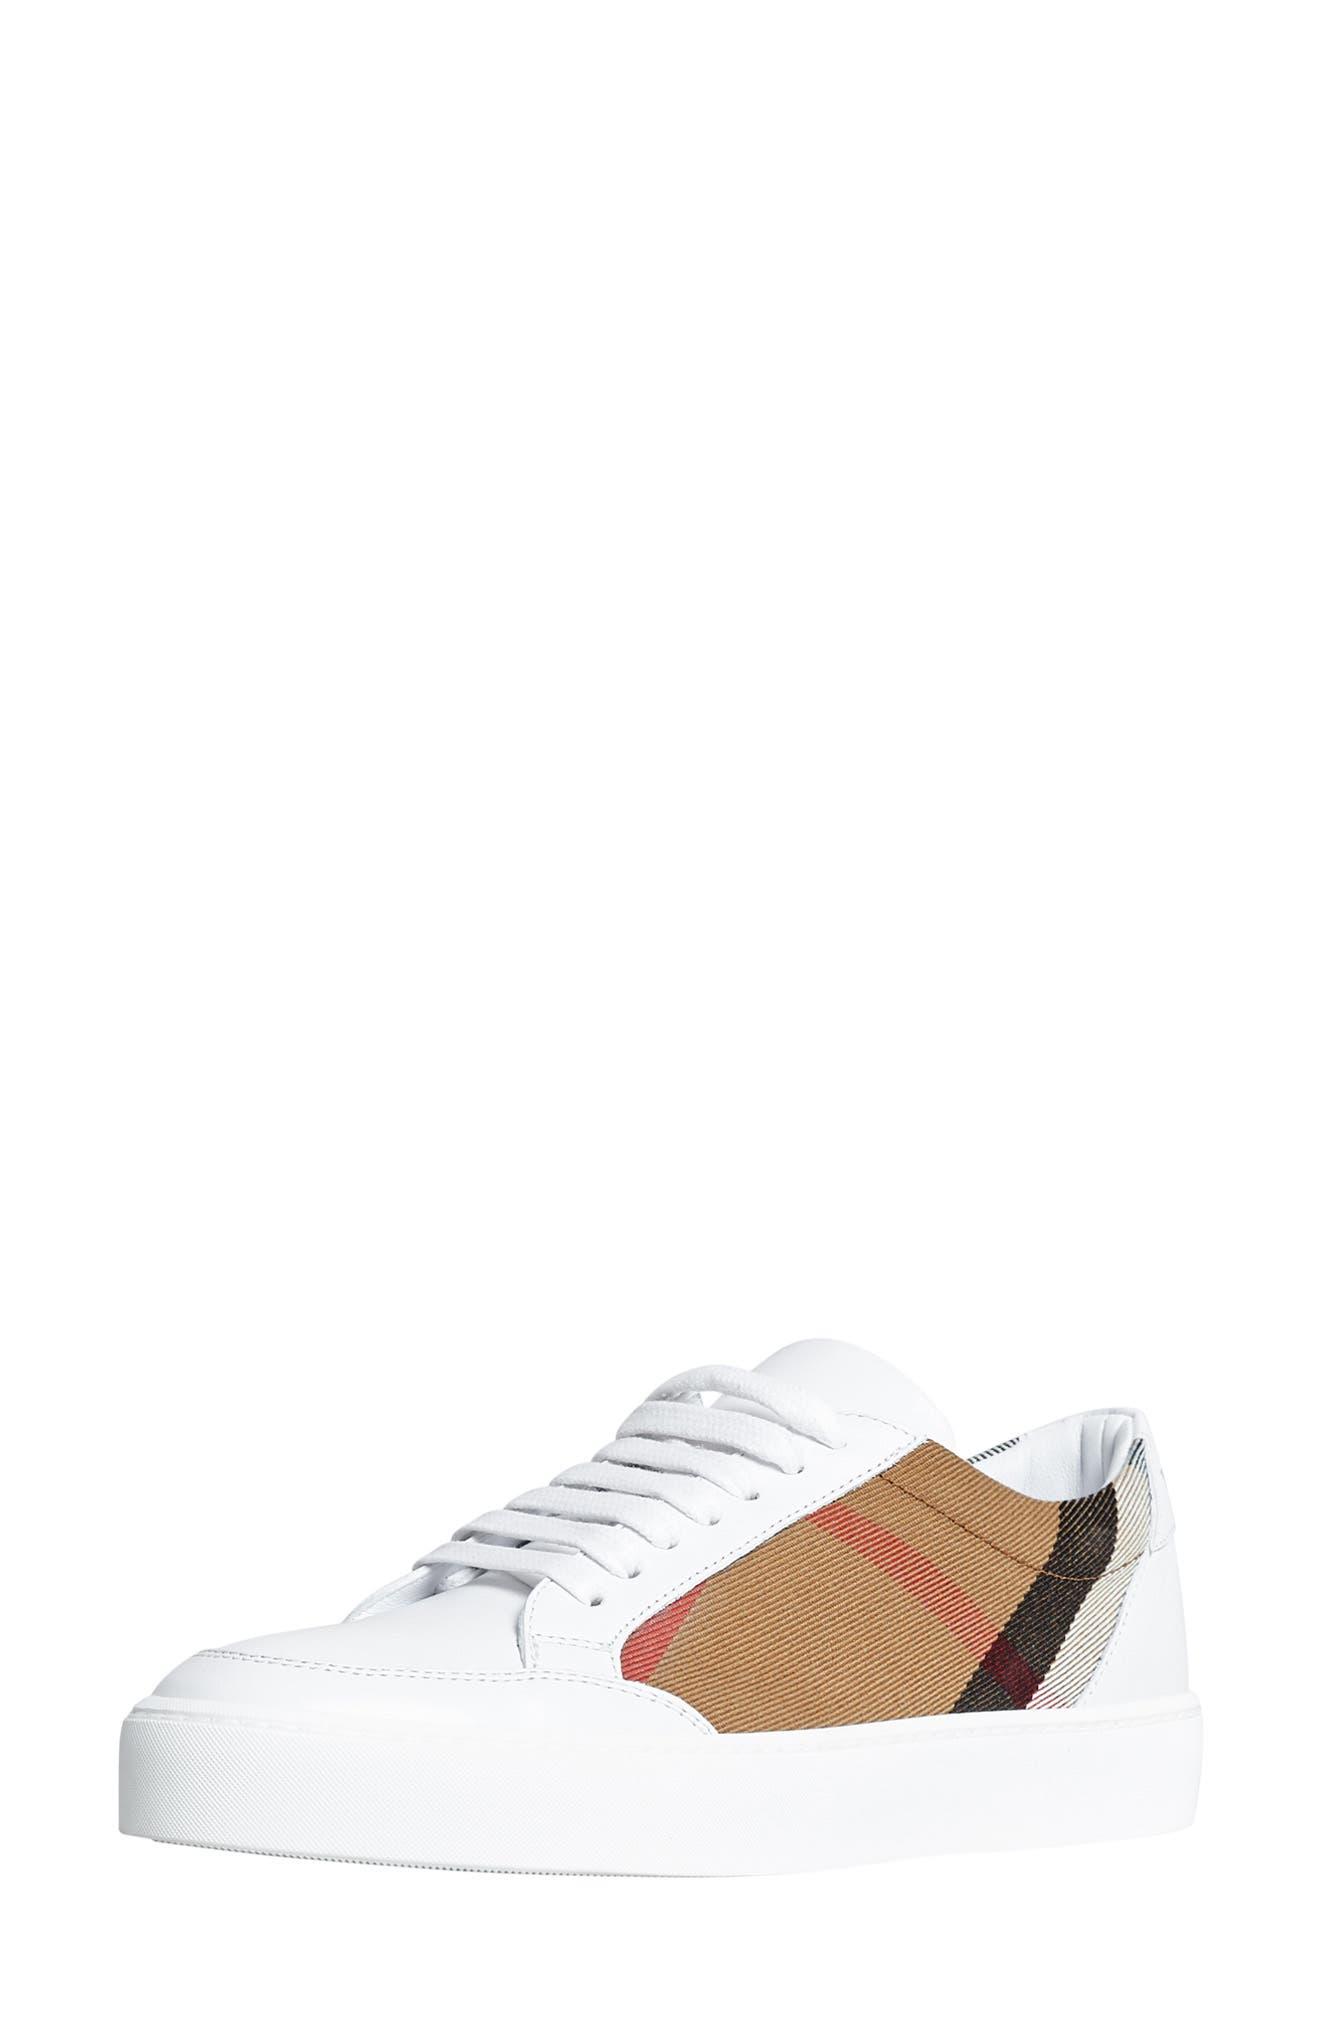 BURBERRY, Salmond Sneaker, Alternate thumbnail 8, color, WHITE